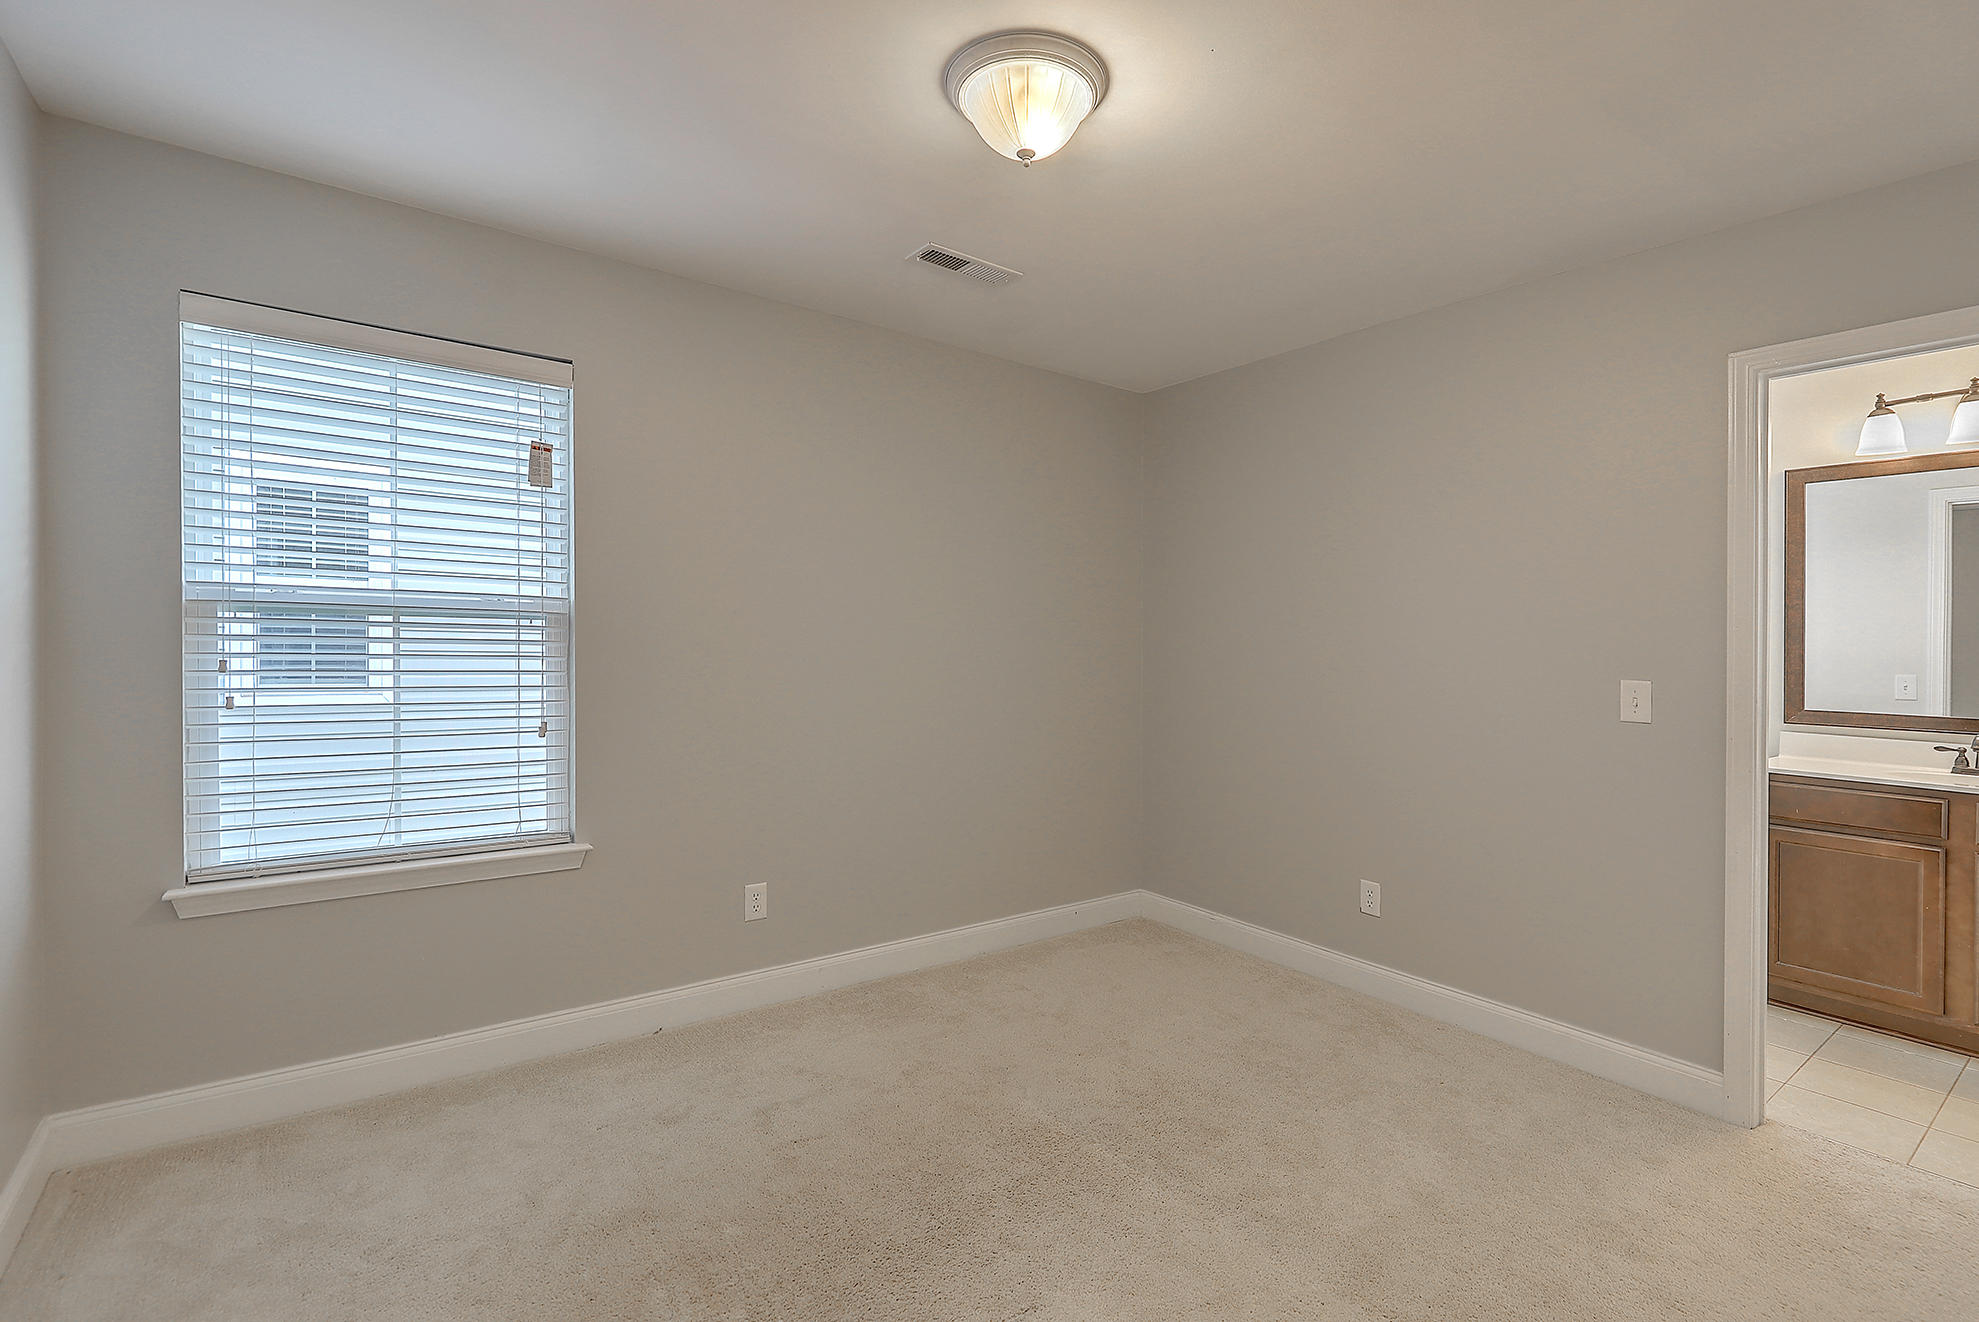 Grand Oaks Plantation Homes For Sale - 175 Larissa, Charleston, SC - 28